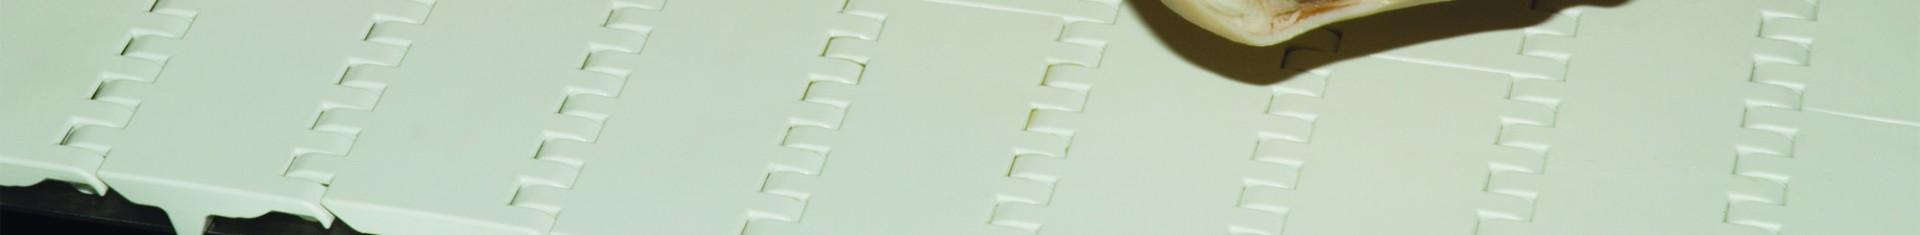 Dyno-Conveyors-Intralox-Meat-Tough-Belt-Banner.jpg